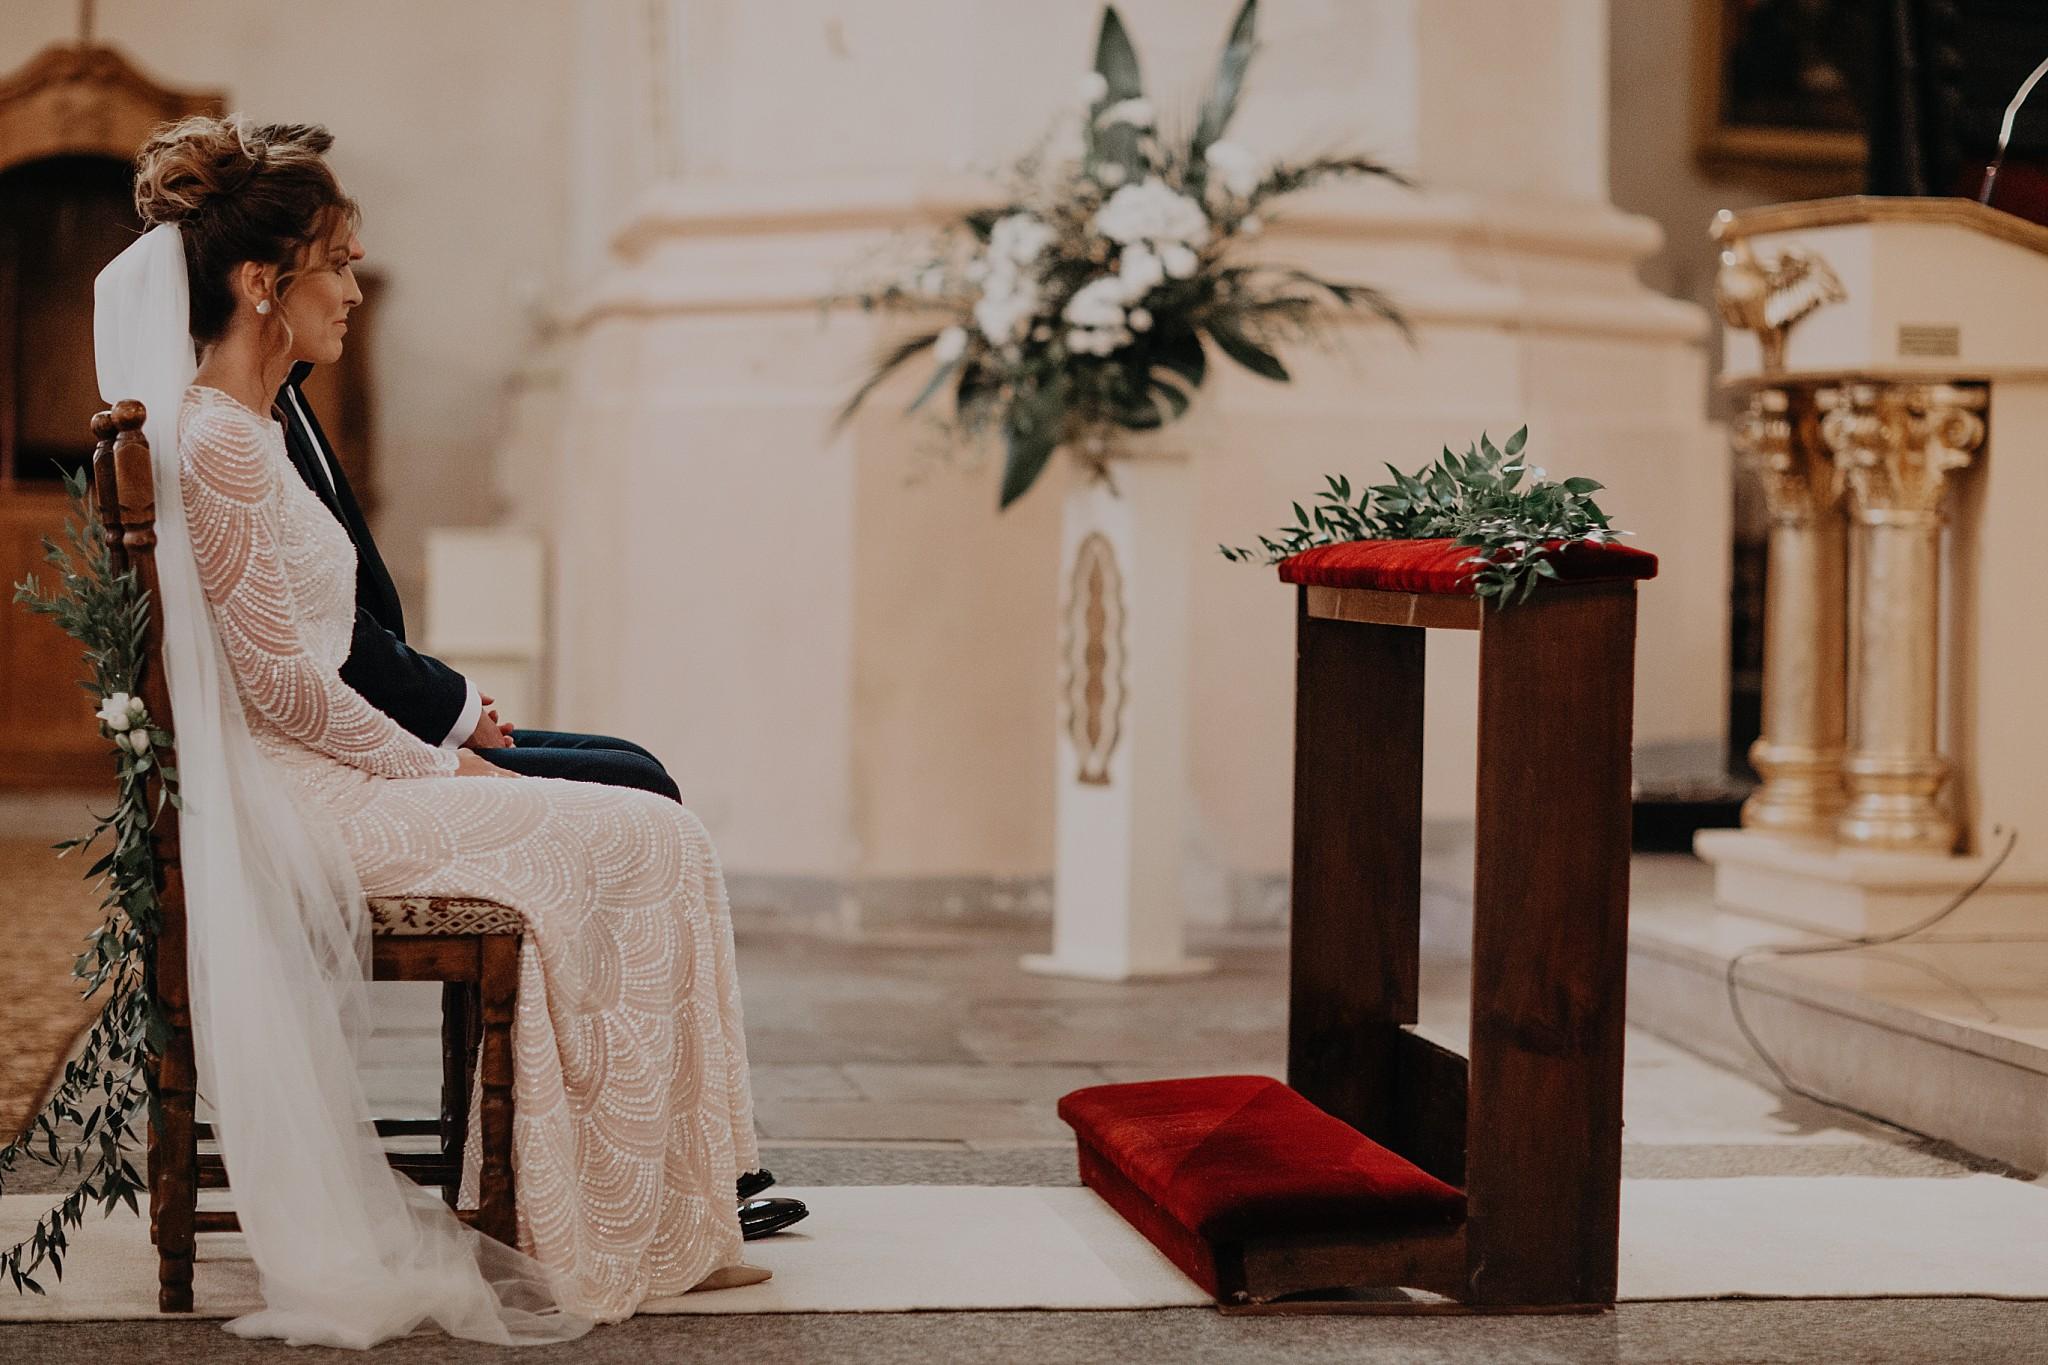 fotograf poznan wesele dobra truskawka piekne wesele pod poznaniem wesele w dobrej truskawce piekna para mloda slub marzen slub koronawirus slub listopad wesele koronawirus 188